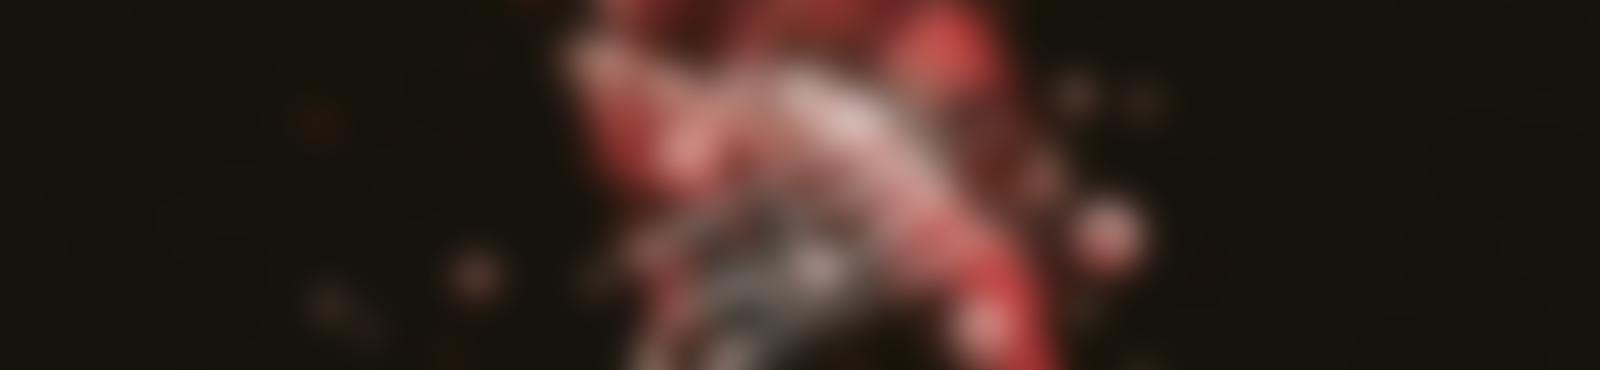 Blurred 7997c62b 3d5e 4ca9 909d fd16f912c1a4